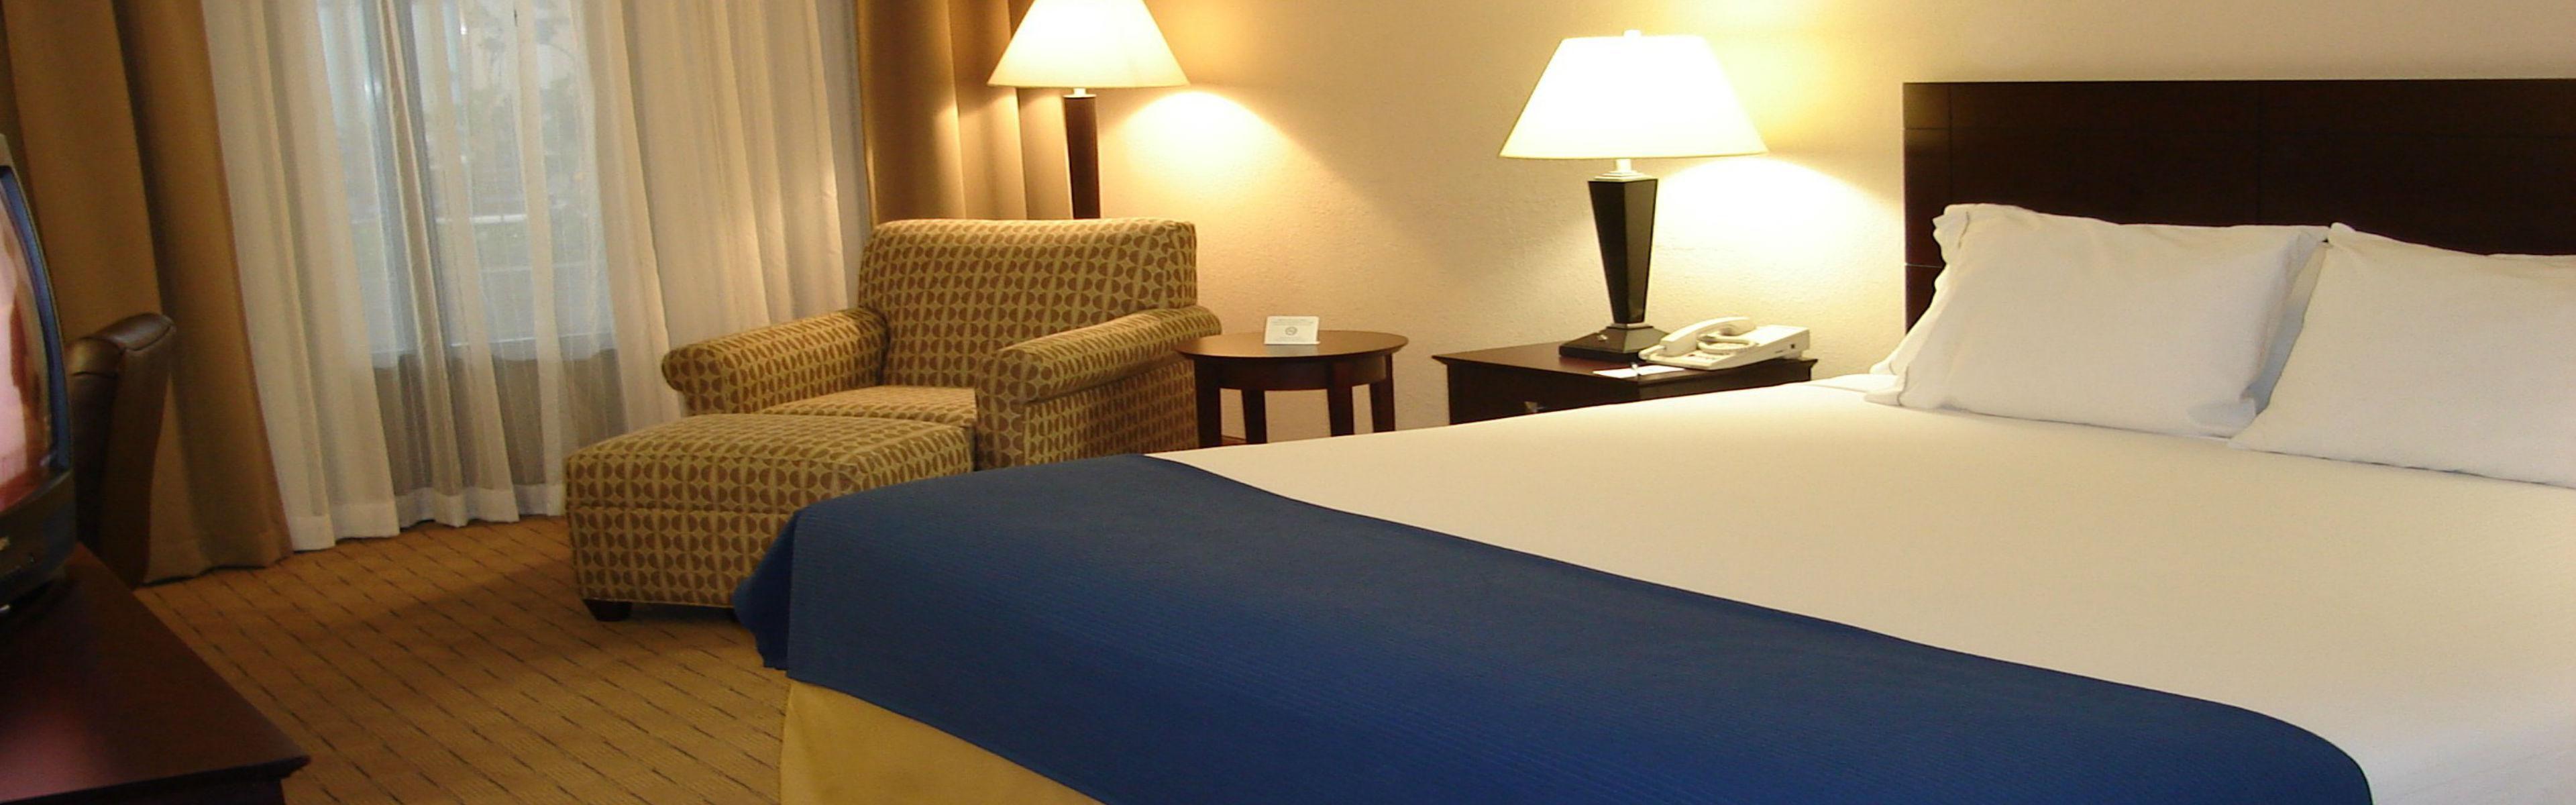 Holiday Inn Express Little Rock-Airport image 1